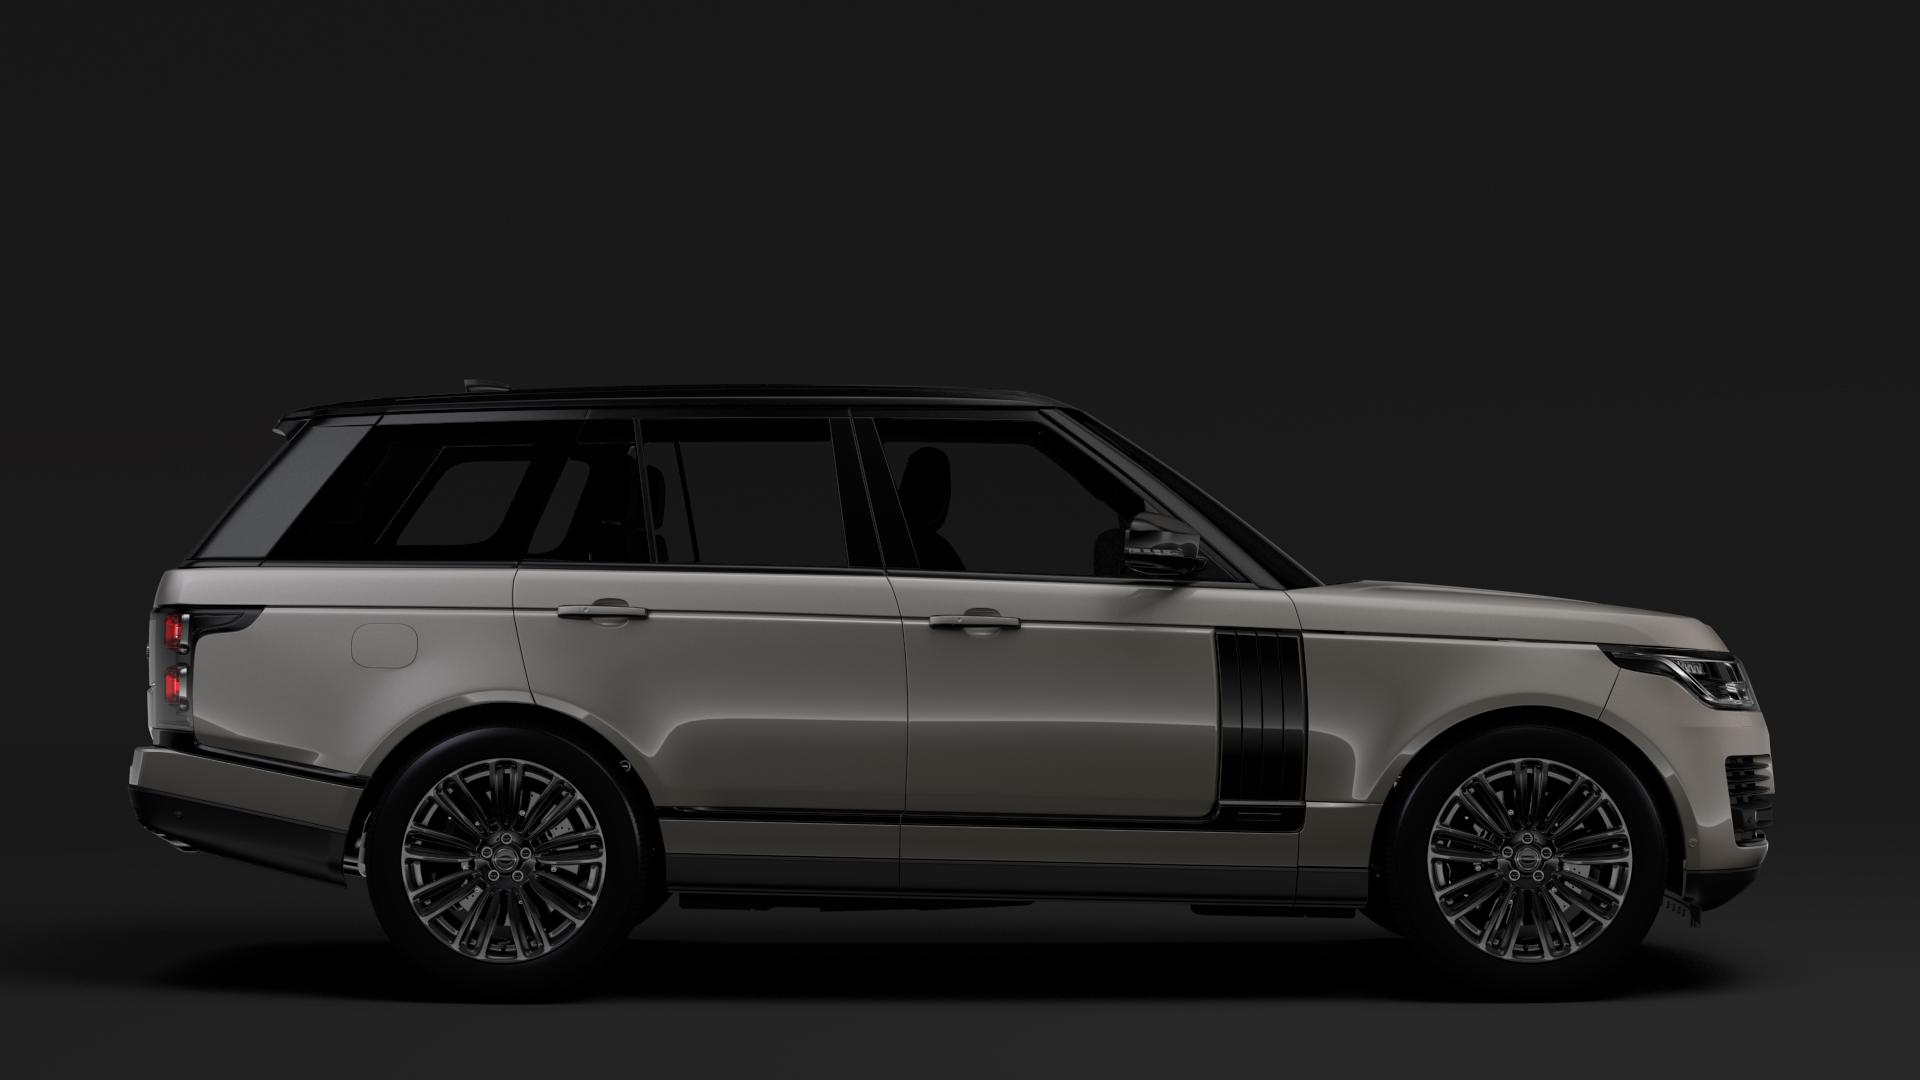 range rover autobiography hybrid (l405) 2018 3d model max fbx c4d lwo ma mb hrc xsi obj 278149